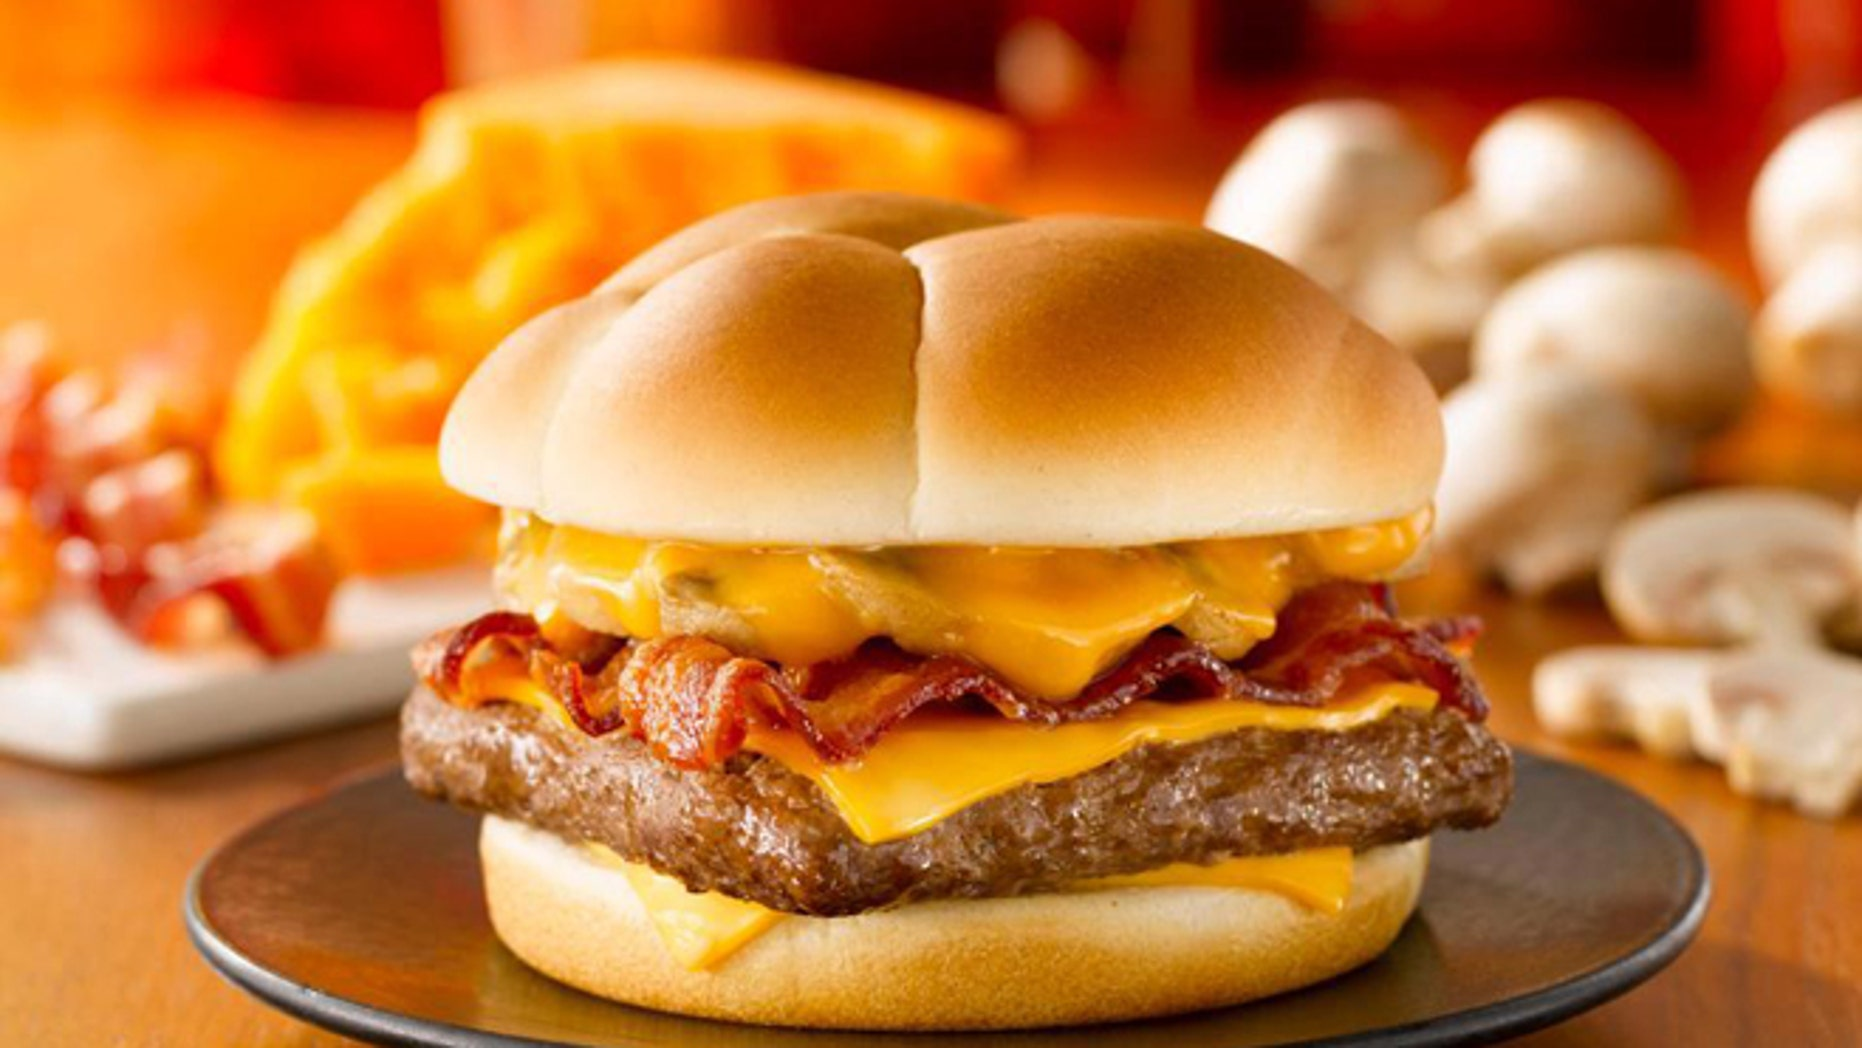 Wendy's new Bacon Portabella Melt